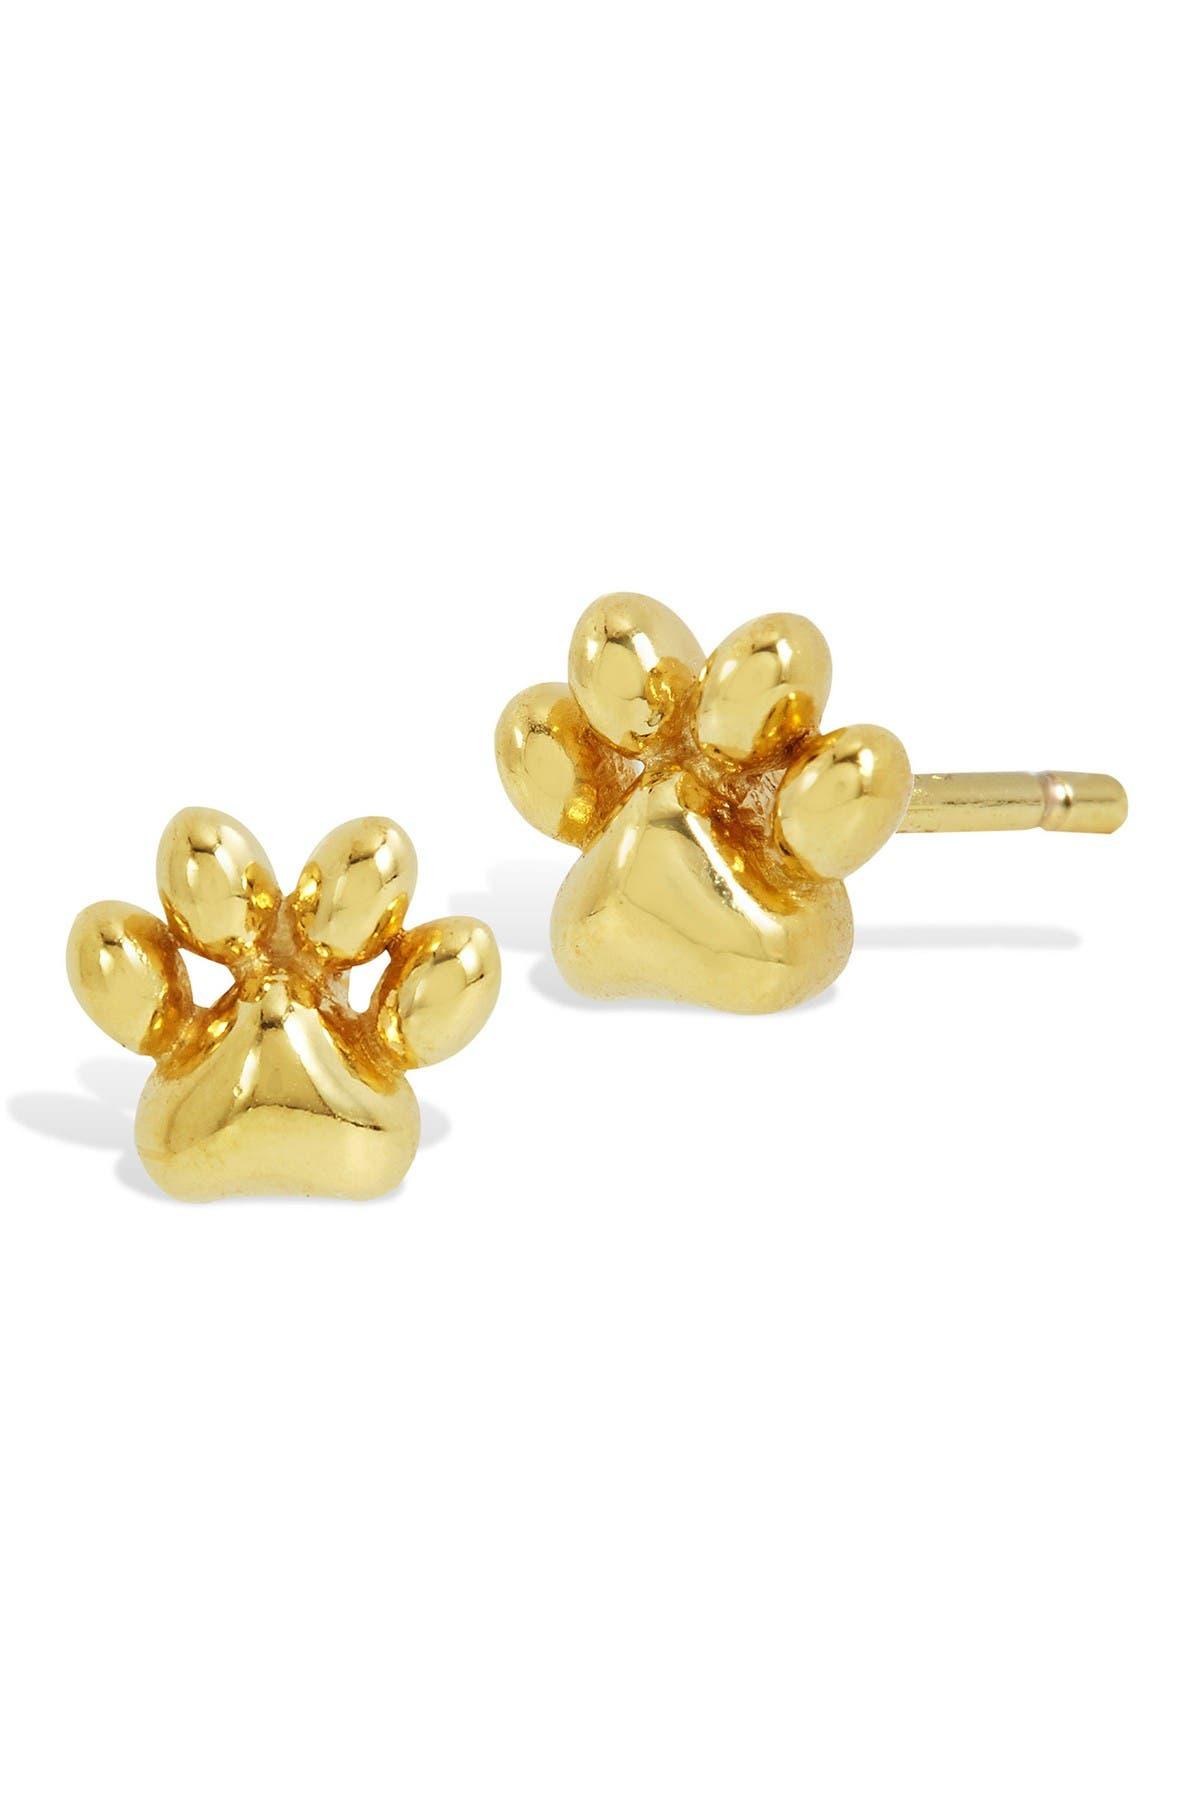 Image of Savvy Cie 18K Gold Vermeil Micro Paw Stud Earrings